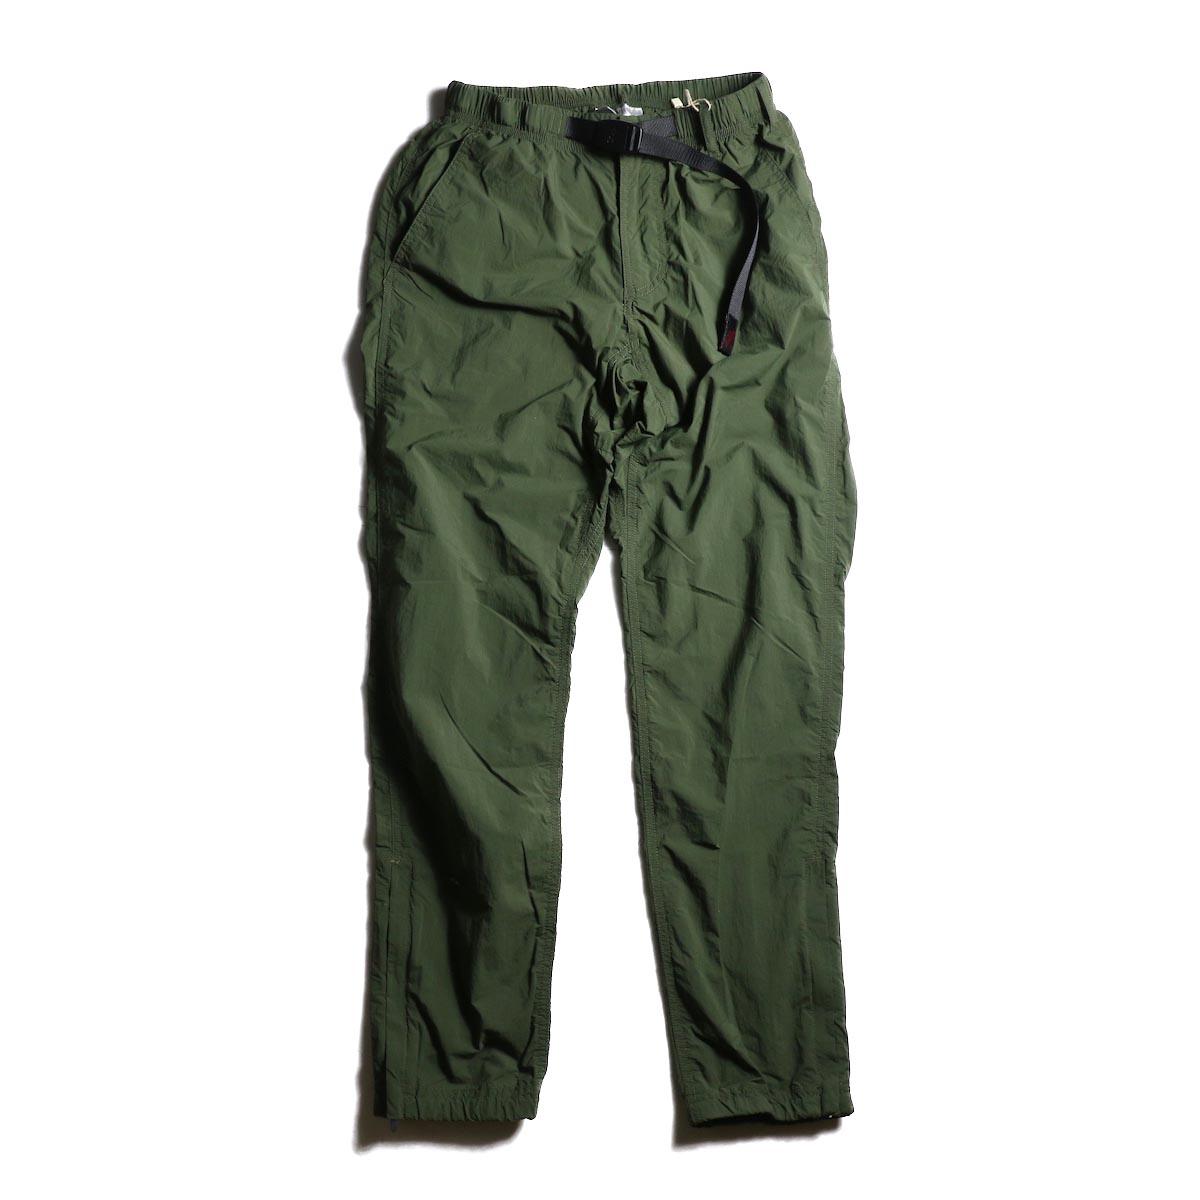 GRAMICCI / Packable Truck Pants (Olive)